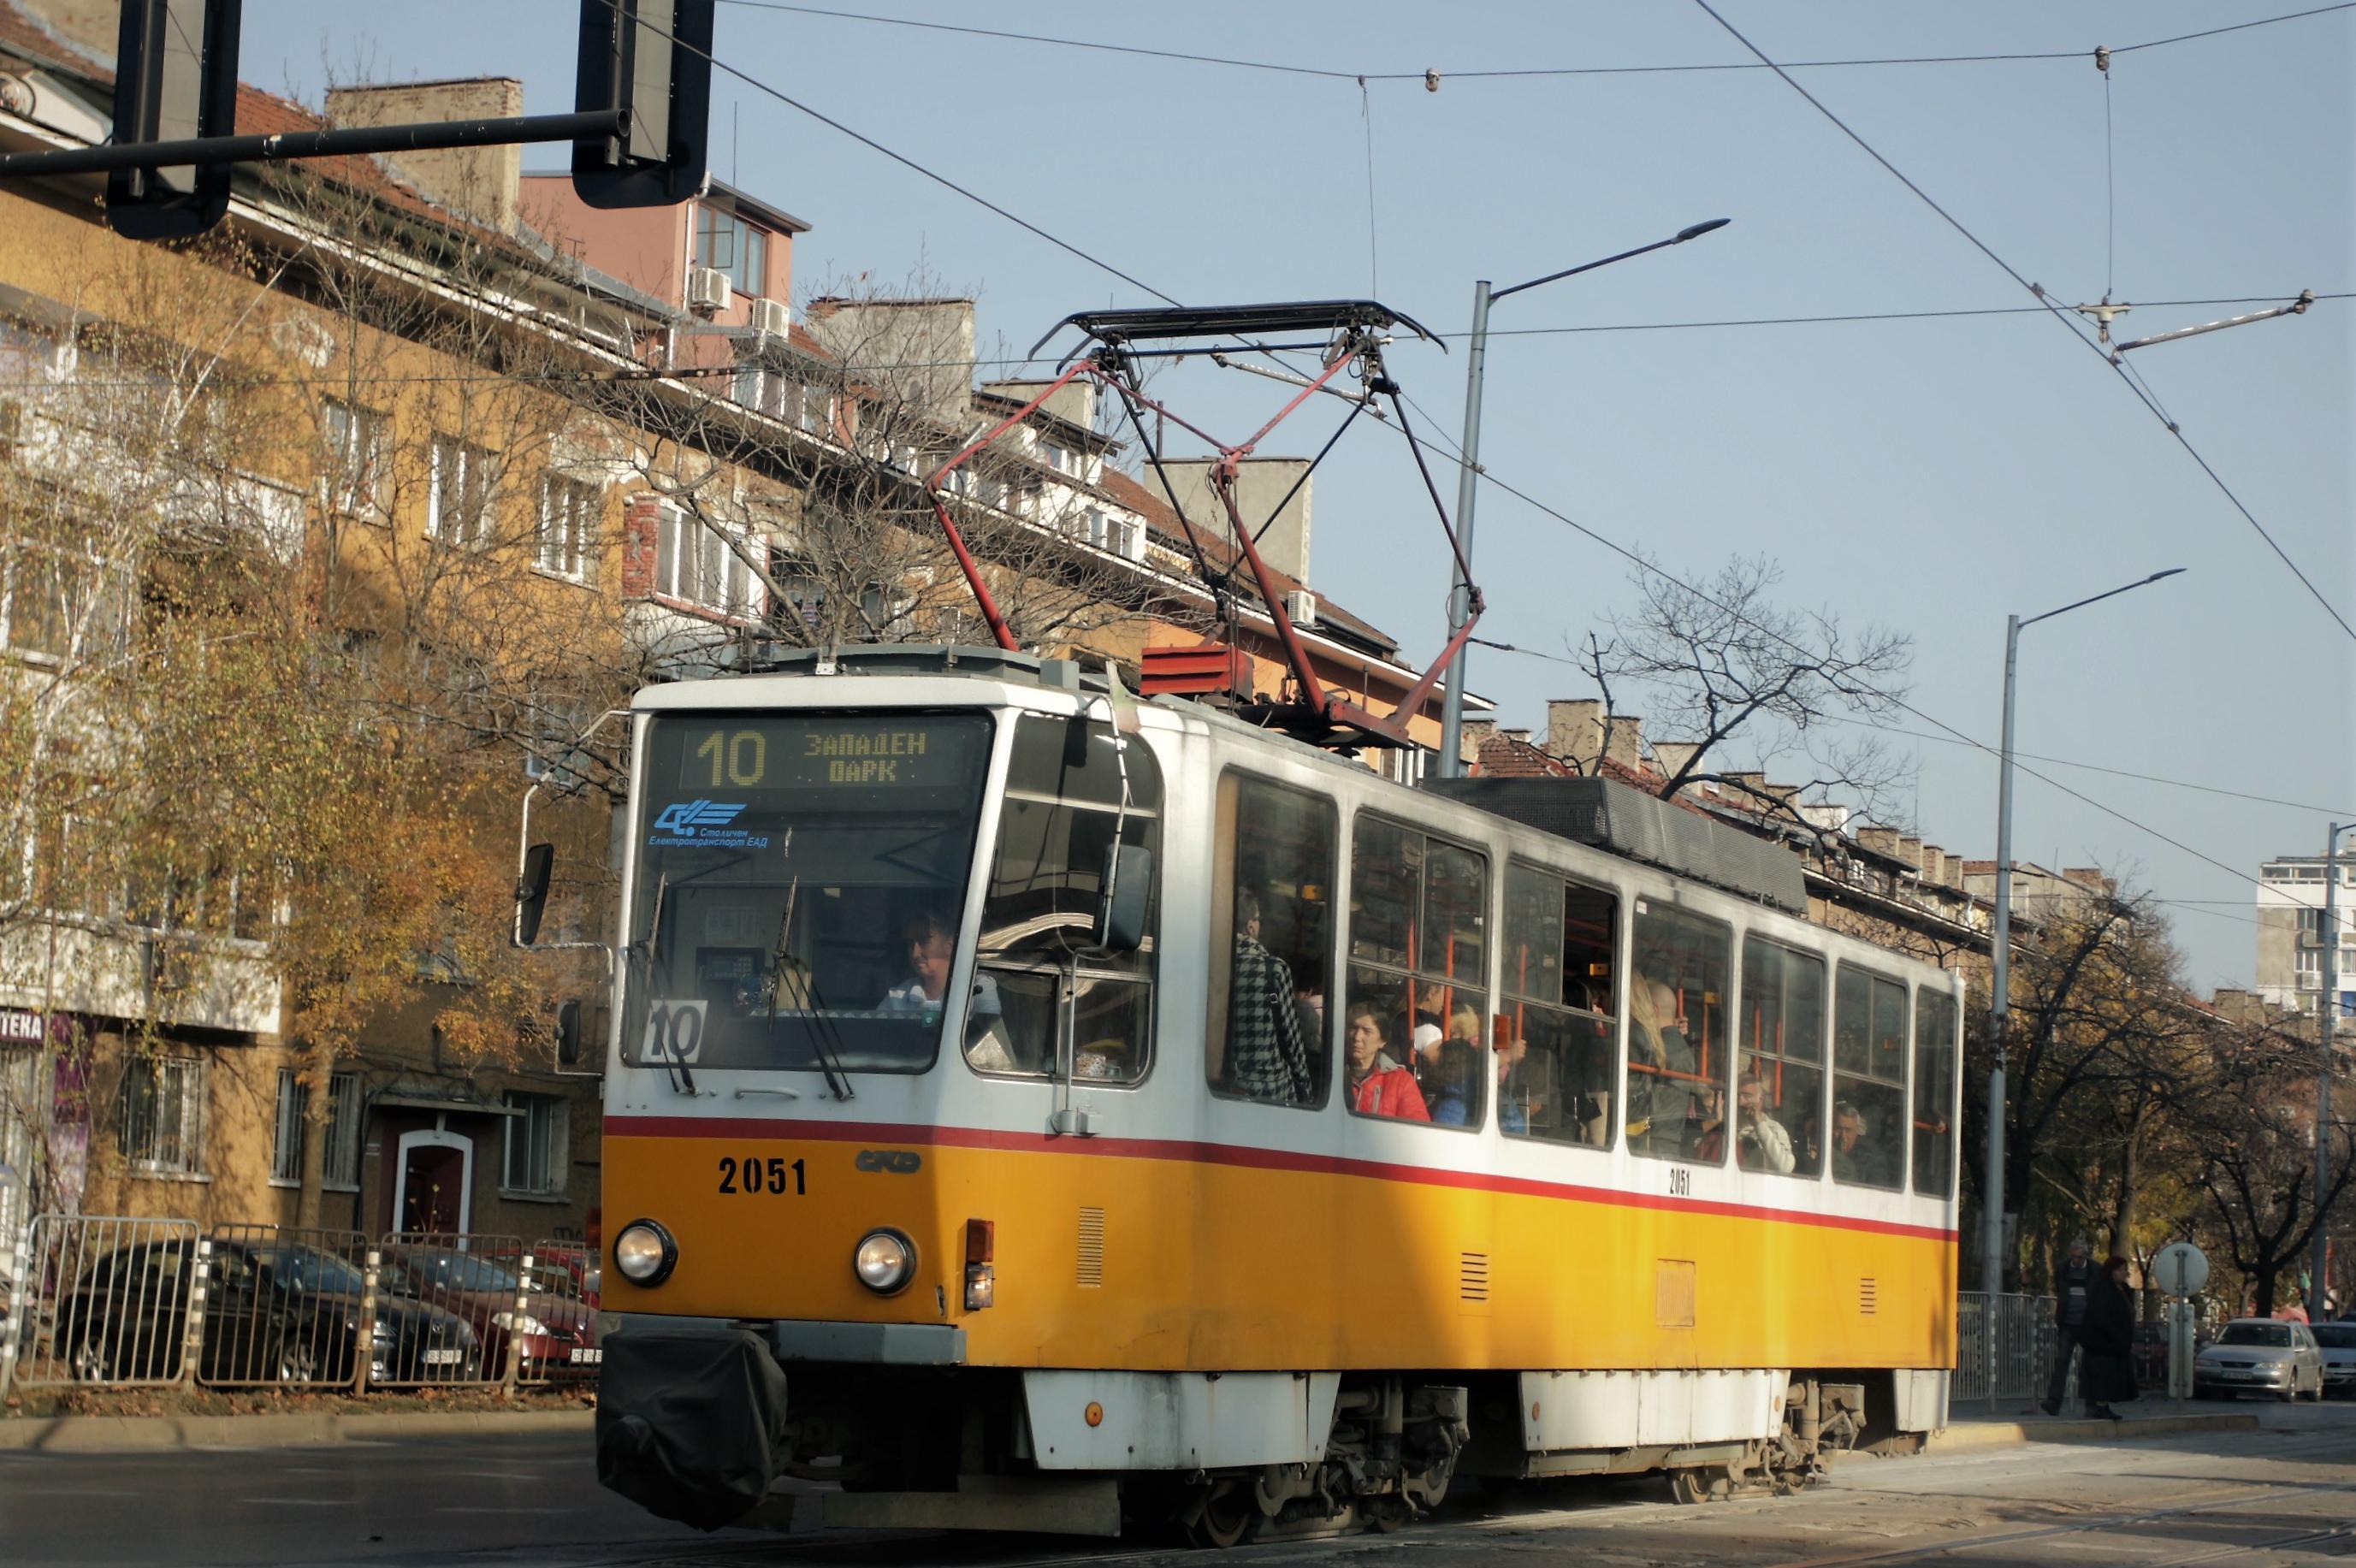 Трамвай 10 катастрофира